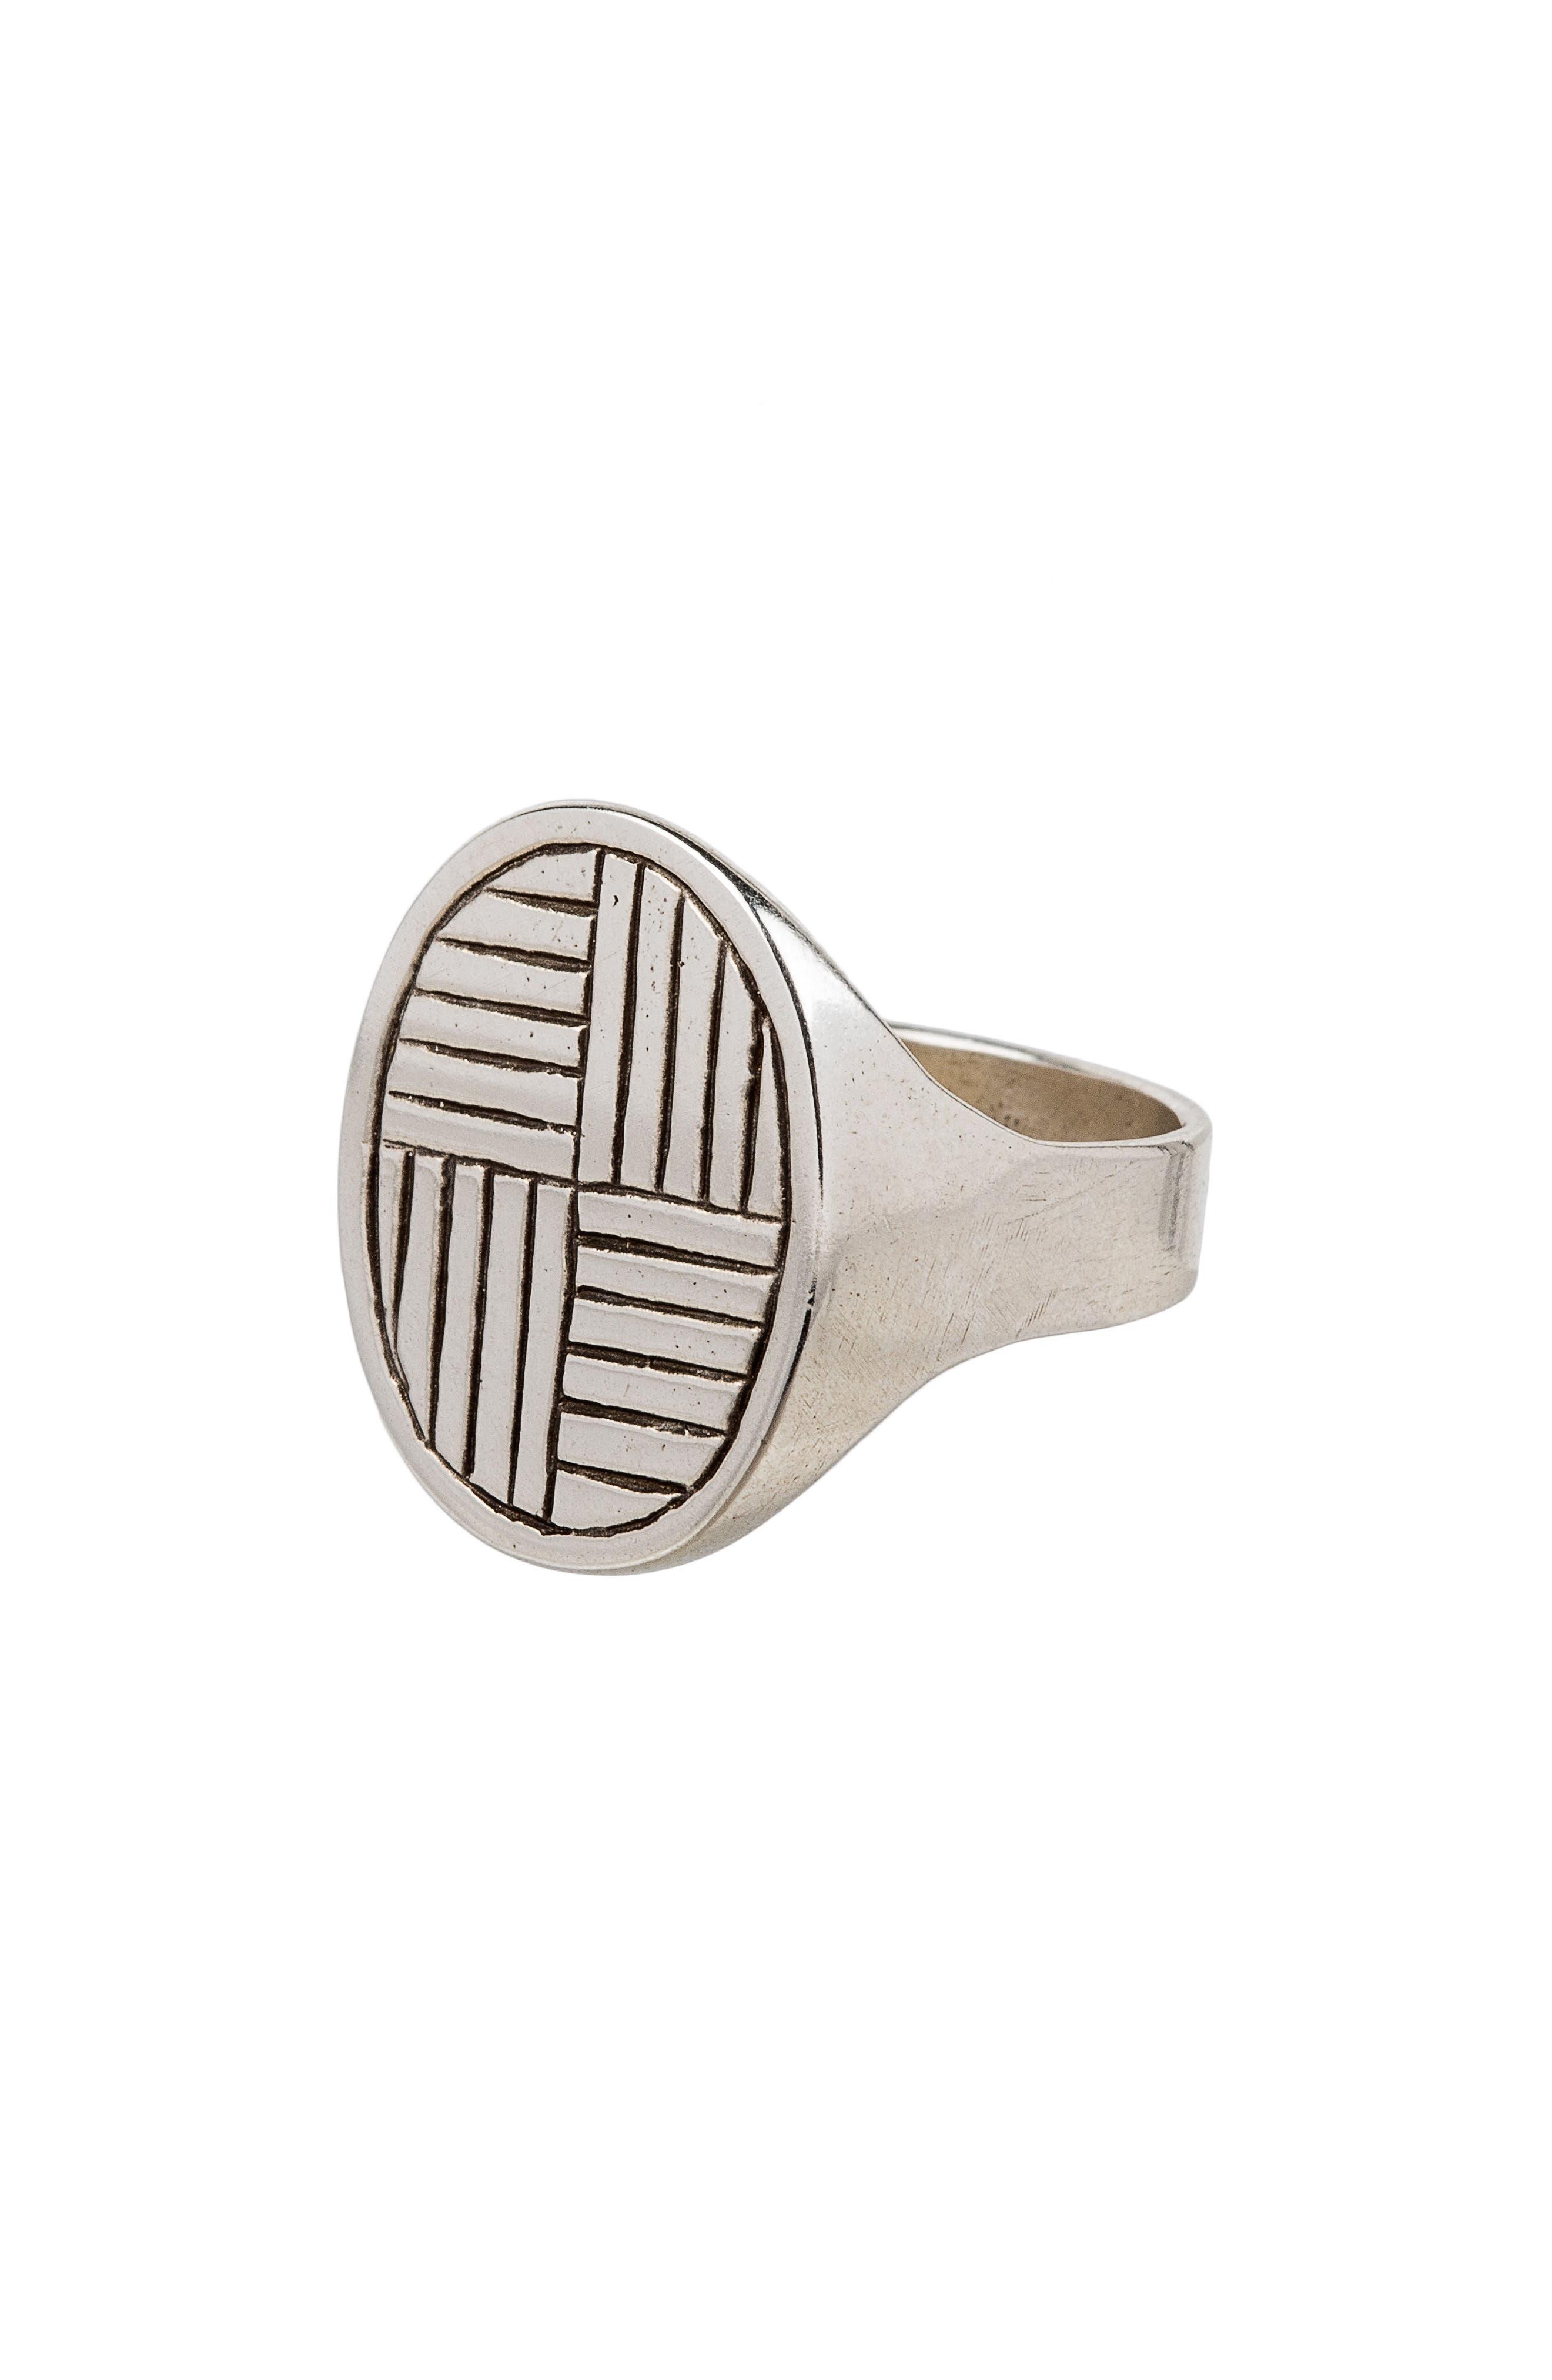 Main Image - Lewis Henry Nicholas Ruskin Ring